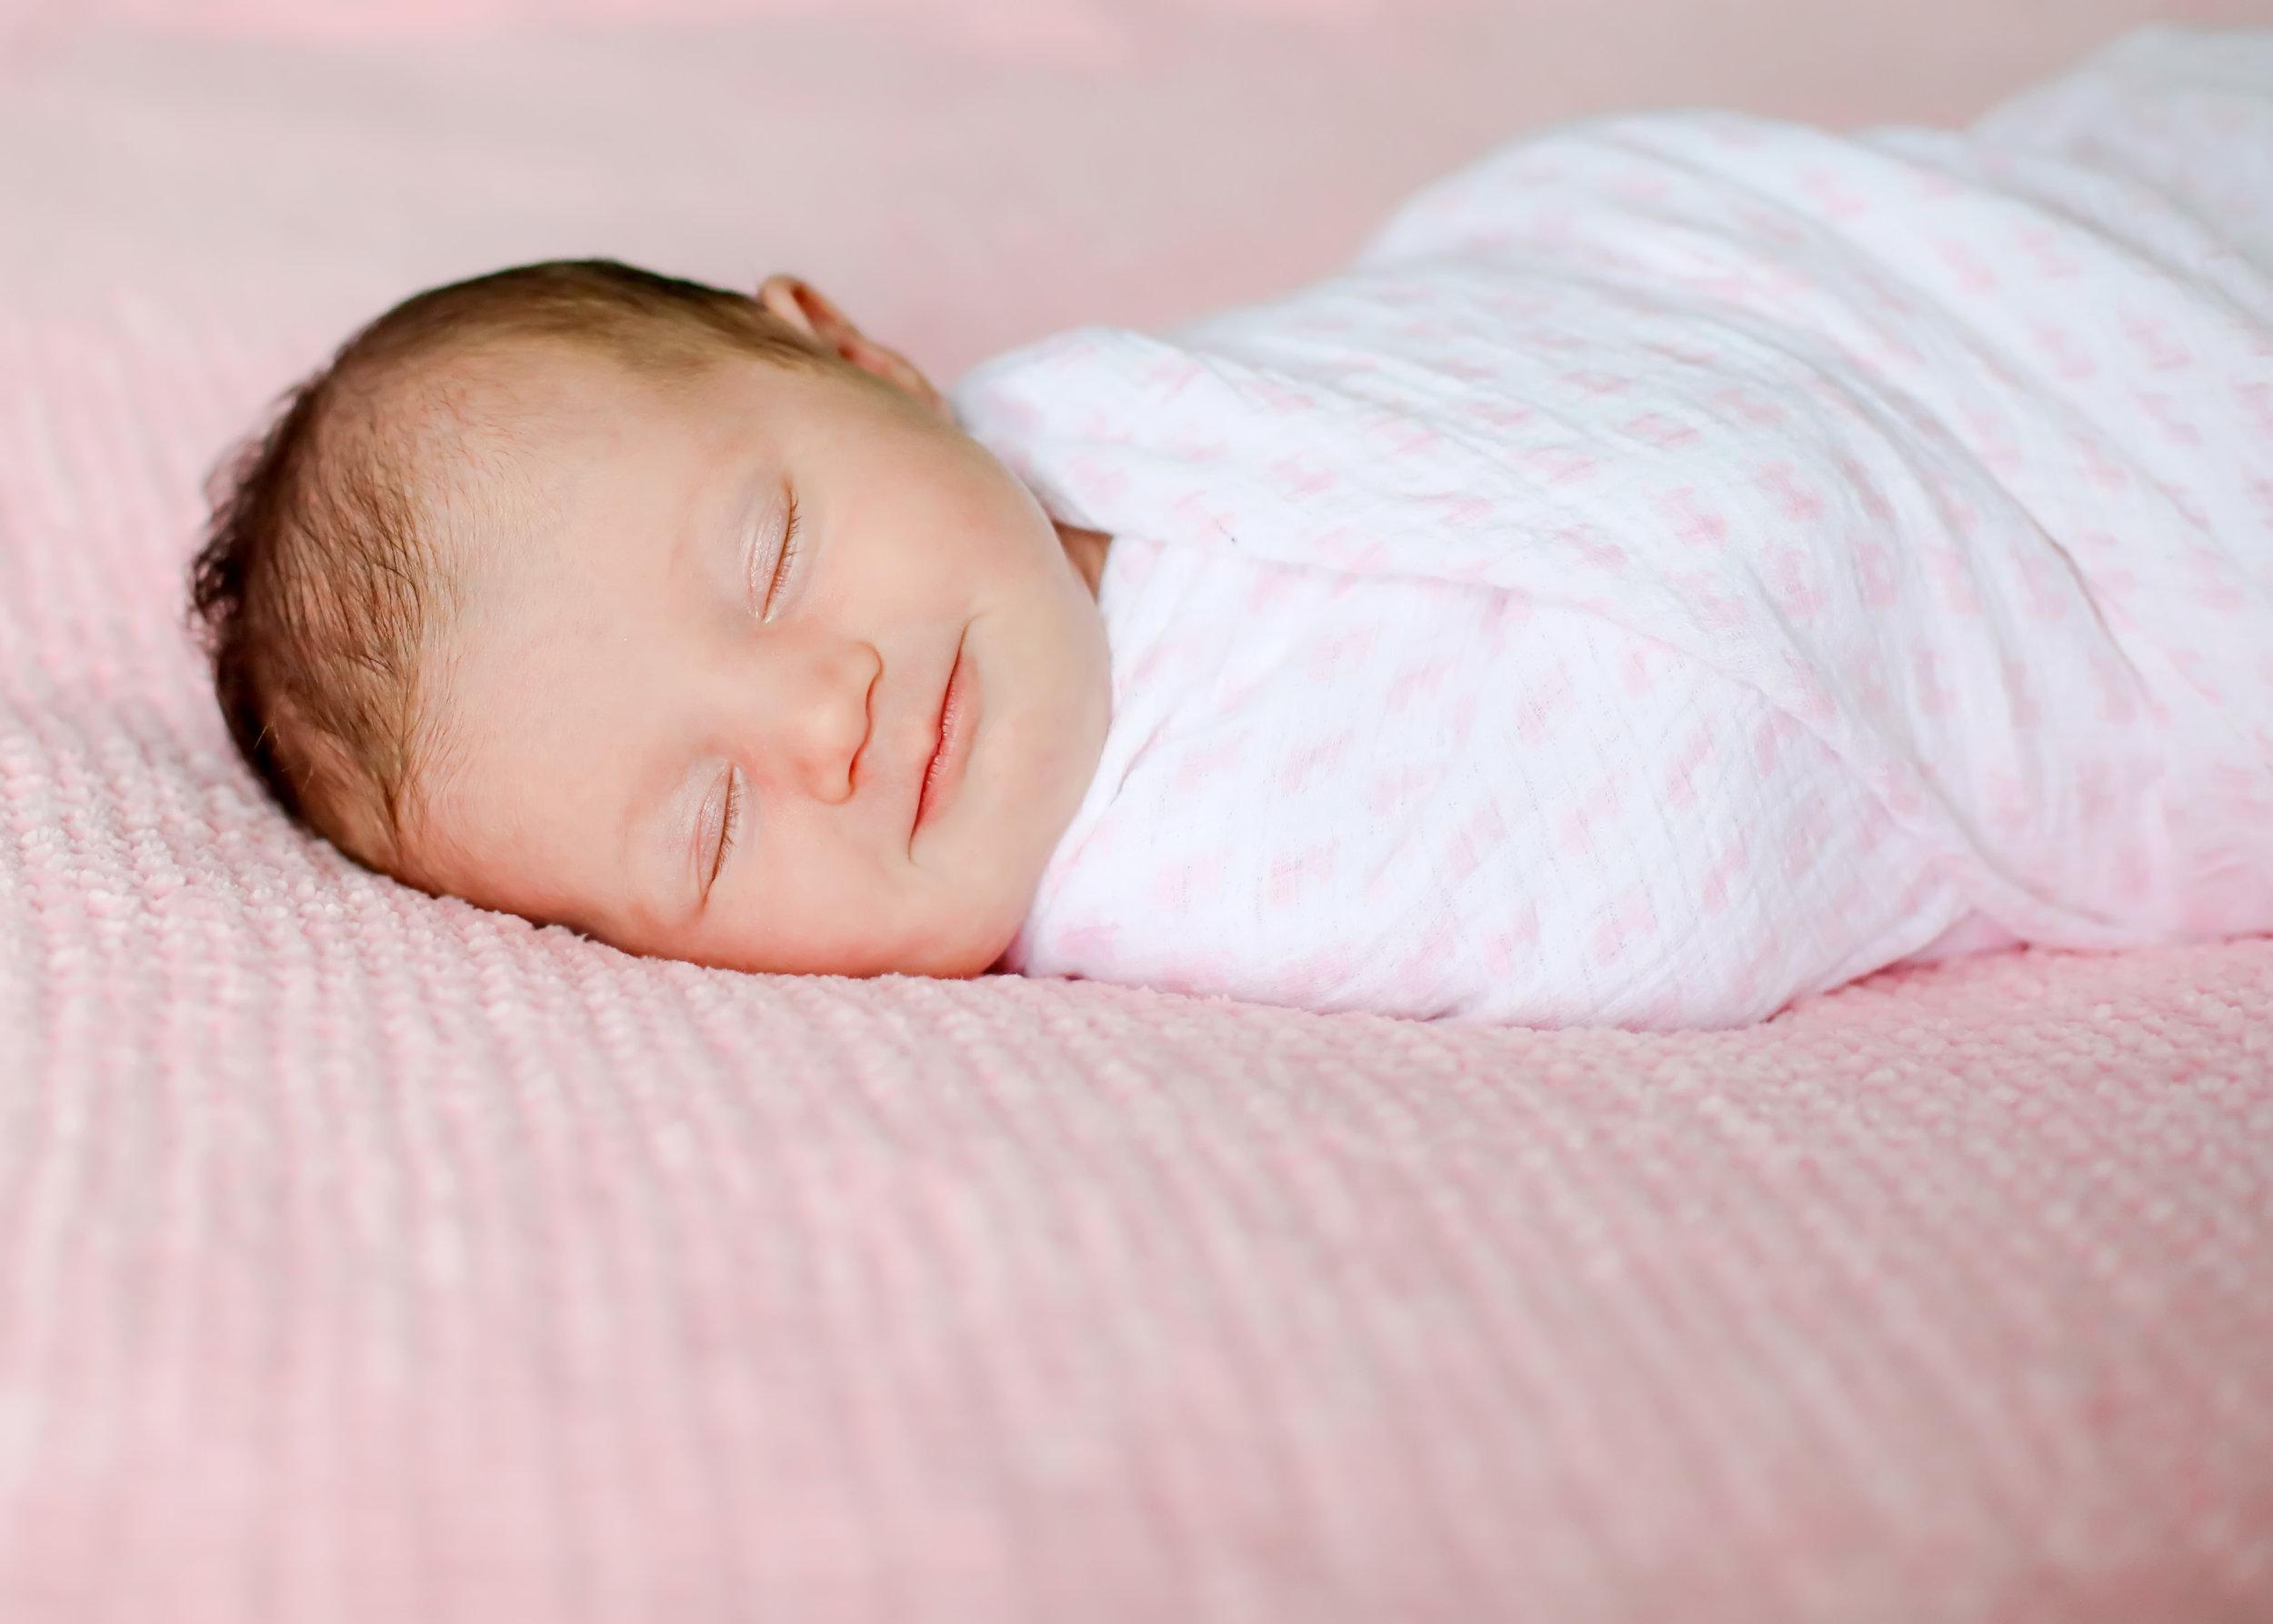 smiling newborn pink blanket.jpg